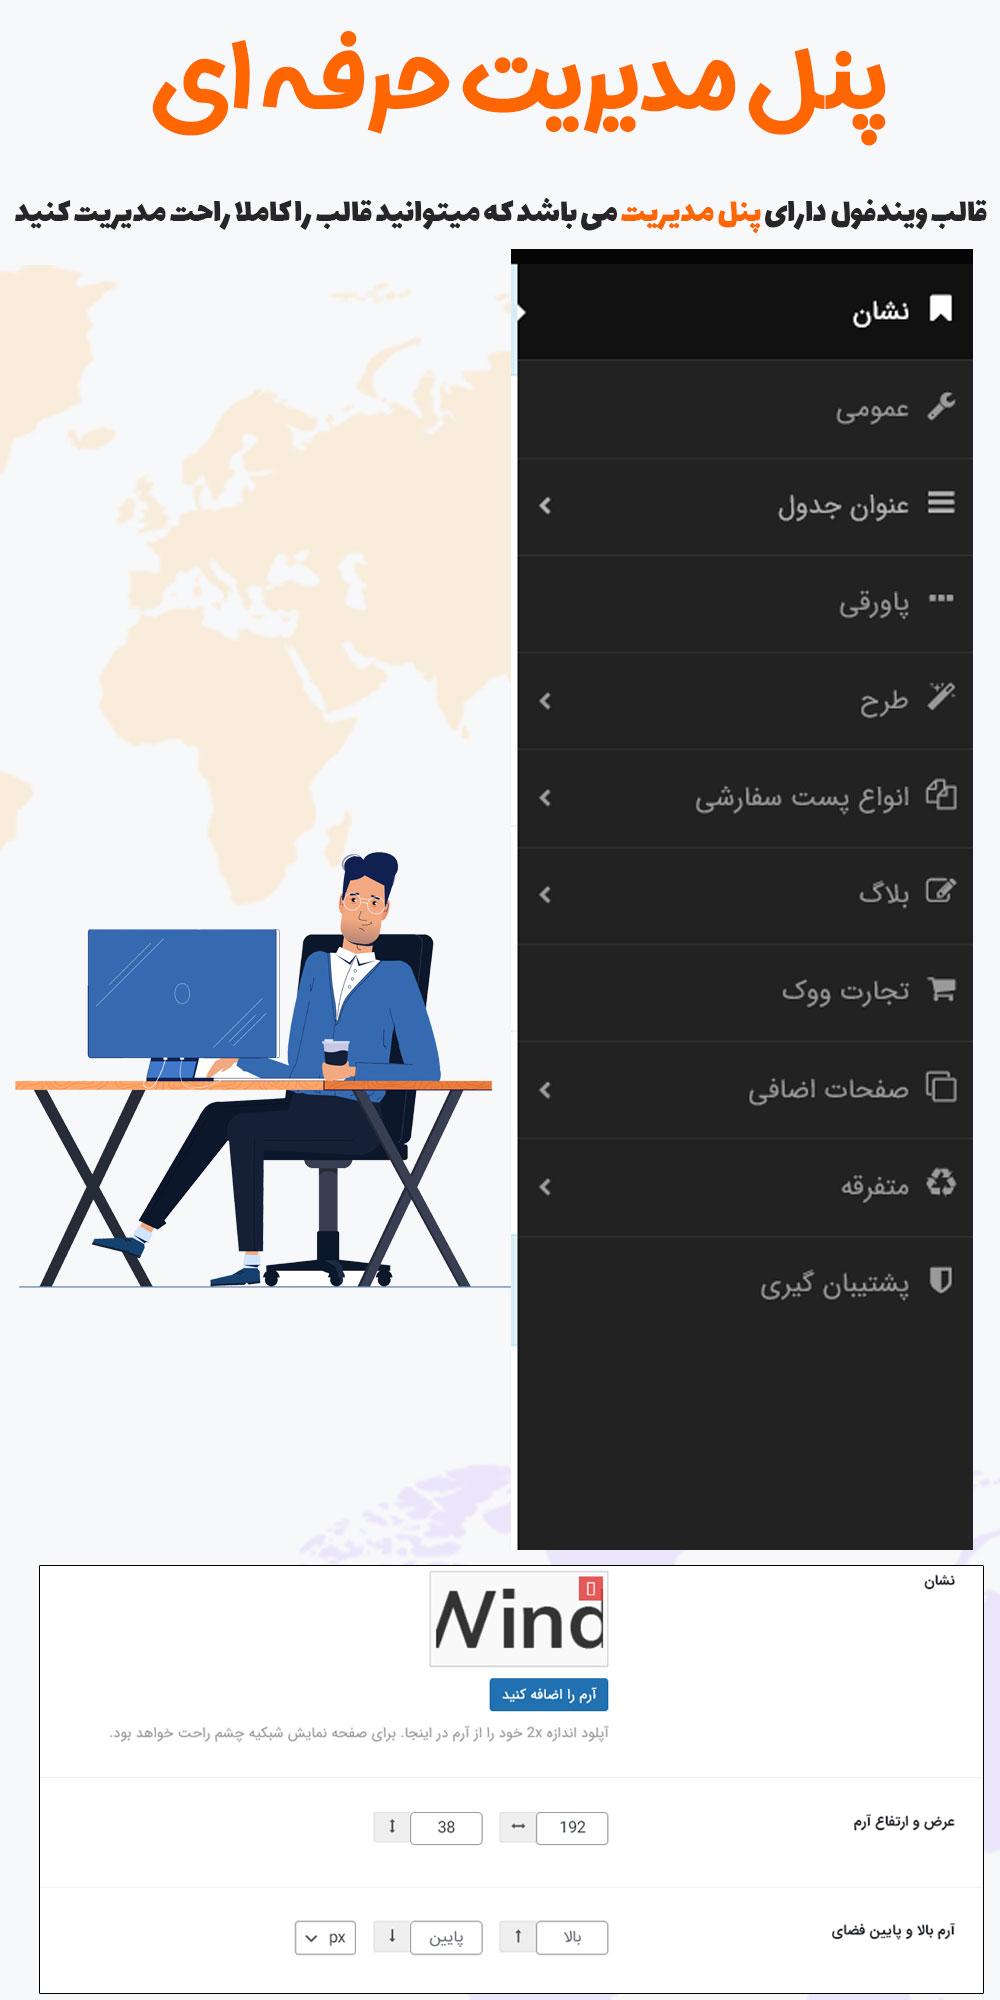 پنل تنظیمات قالب ویندفول